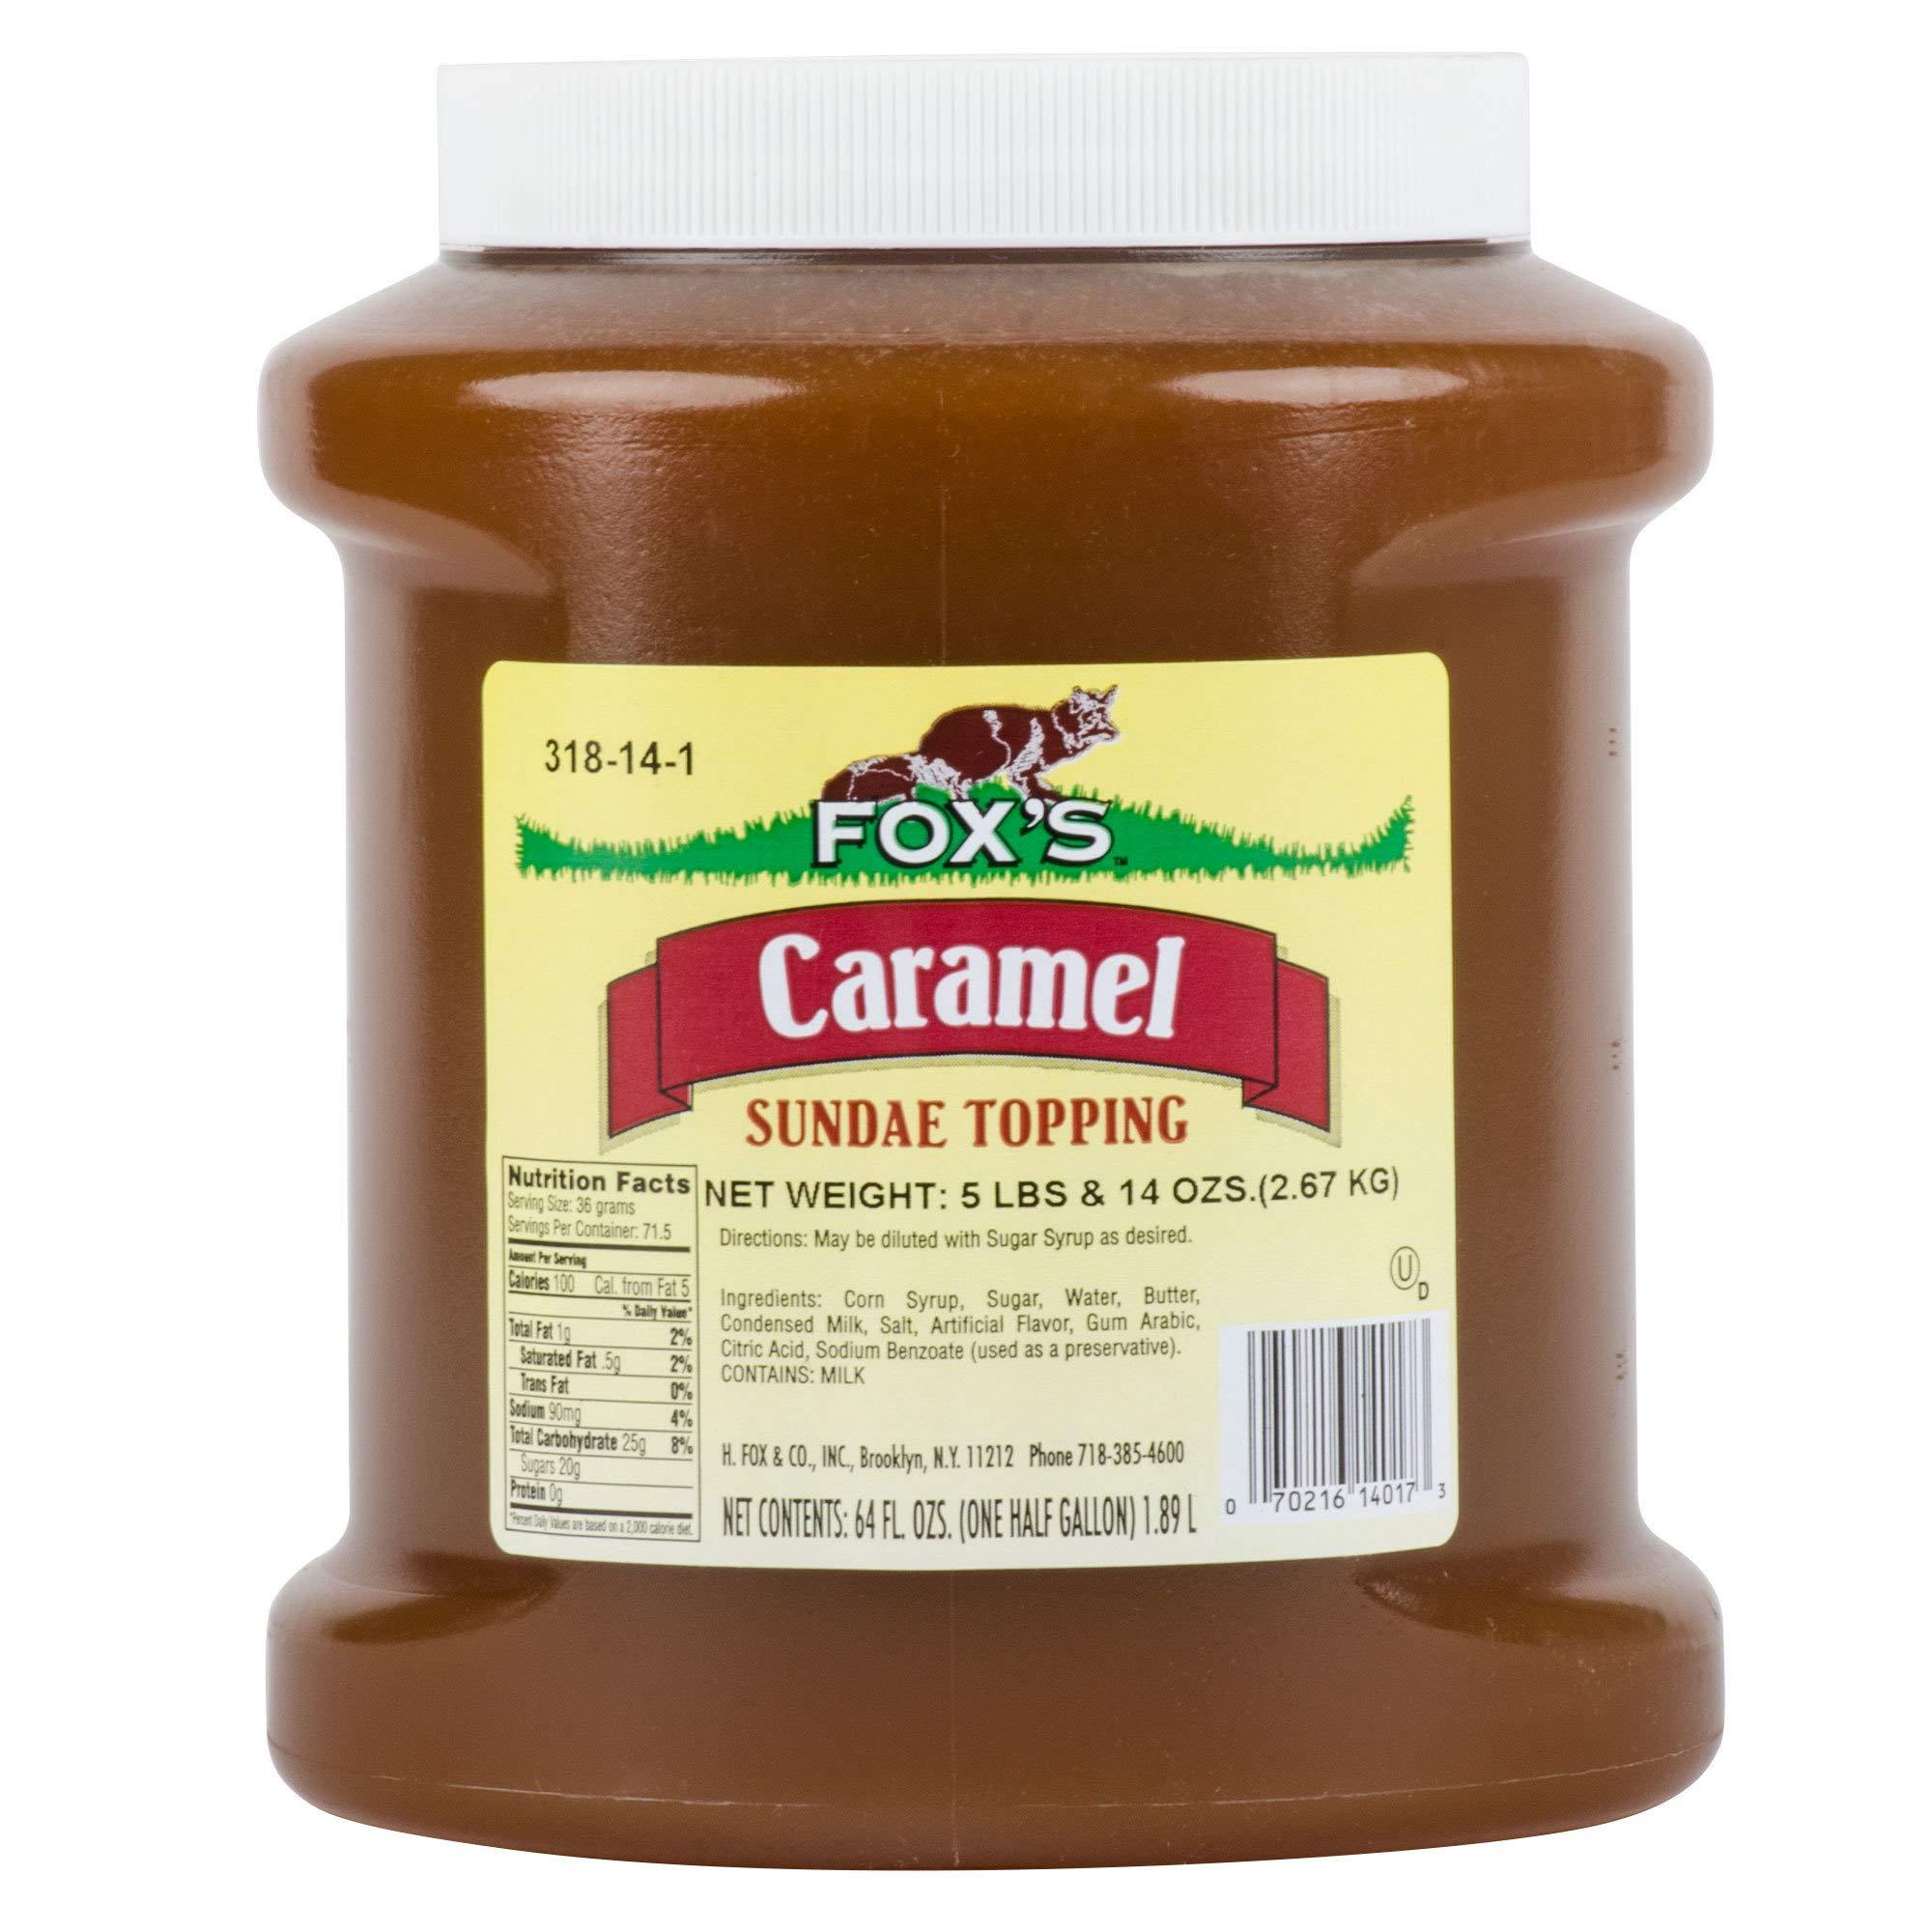 TableTop King 1/2 Gallon Caramel Ice Cream Sundae Topping - 6/Case